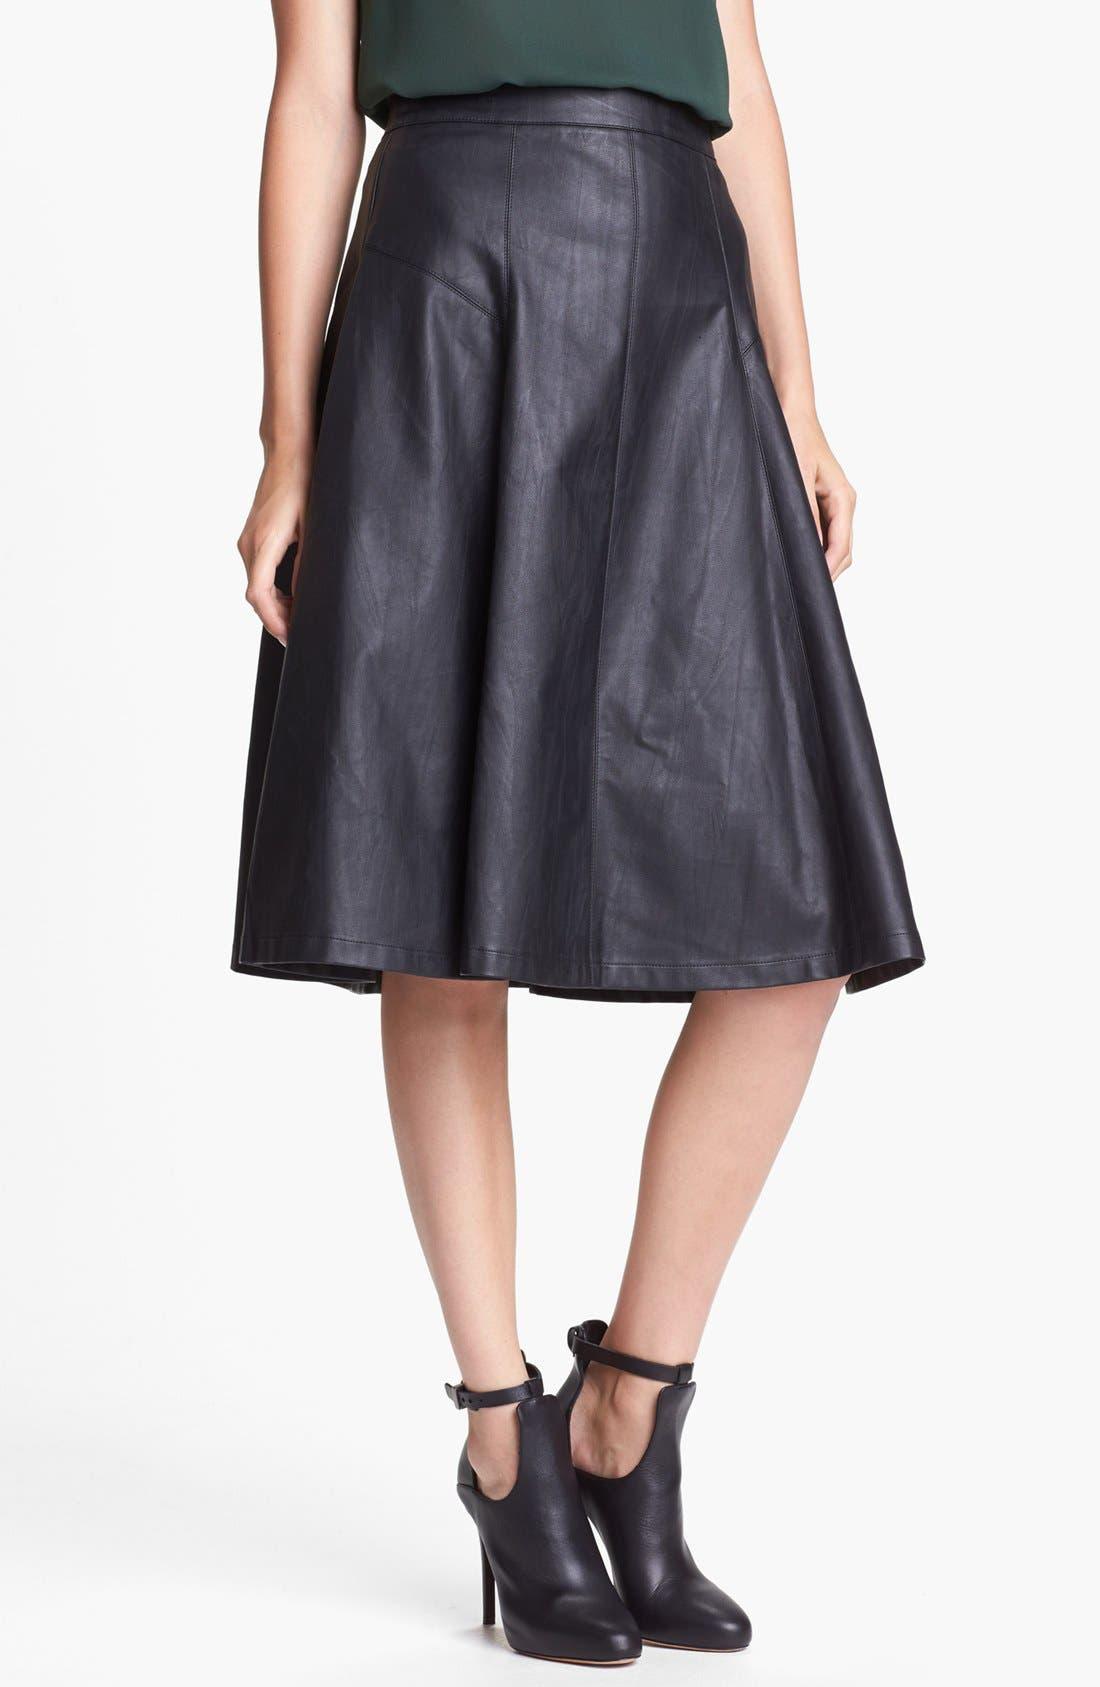 ASTR THE LABEL, ASTR Faux Leather Midi Skirt, Main thumbnail 1, color, 001